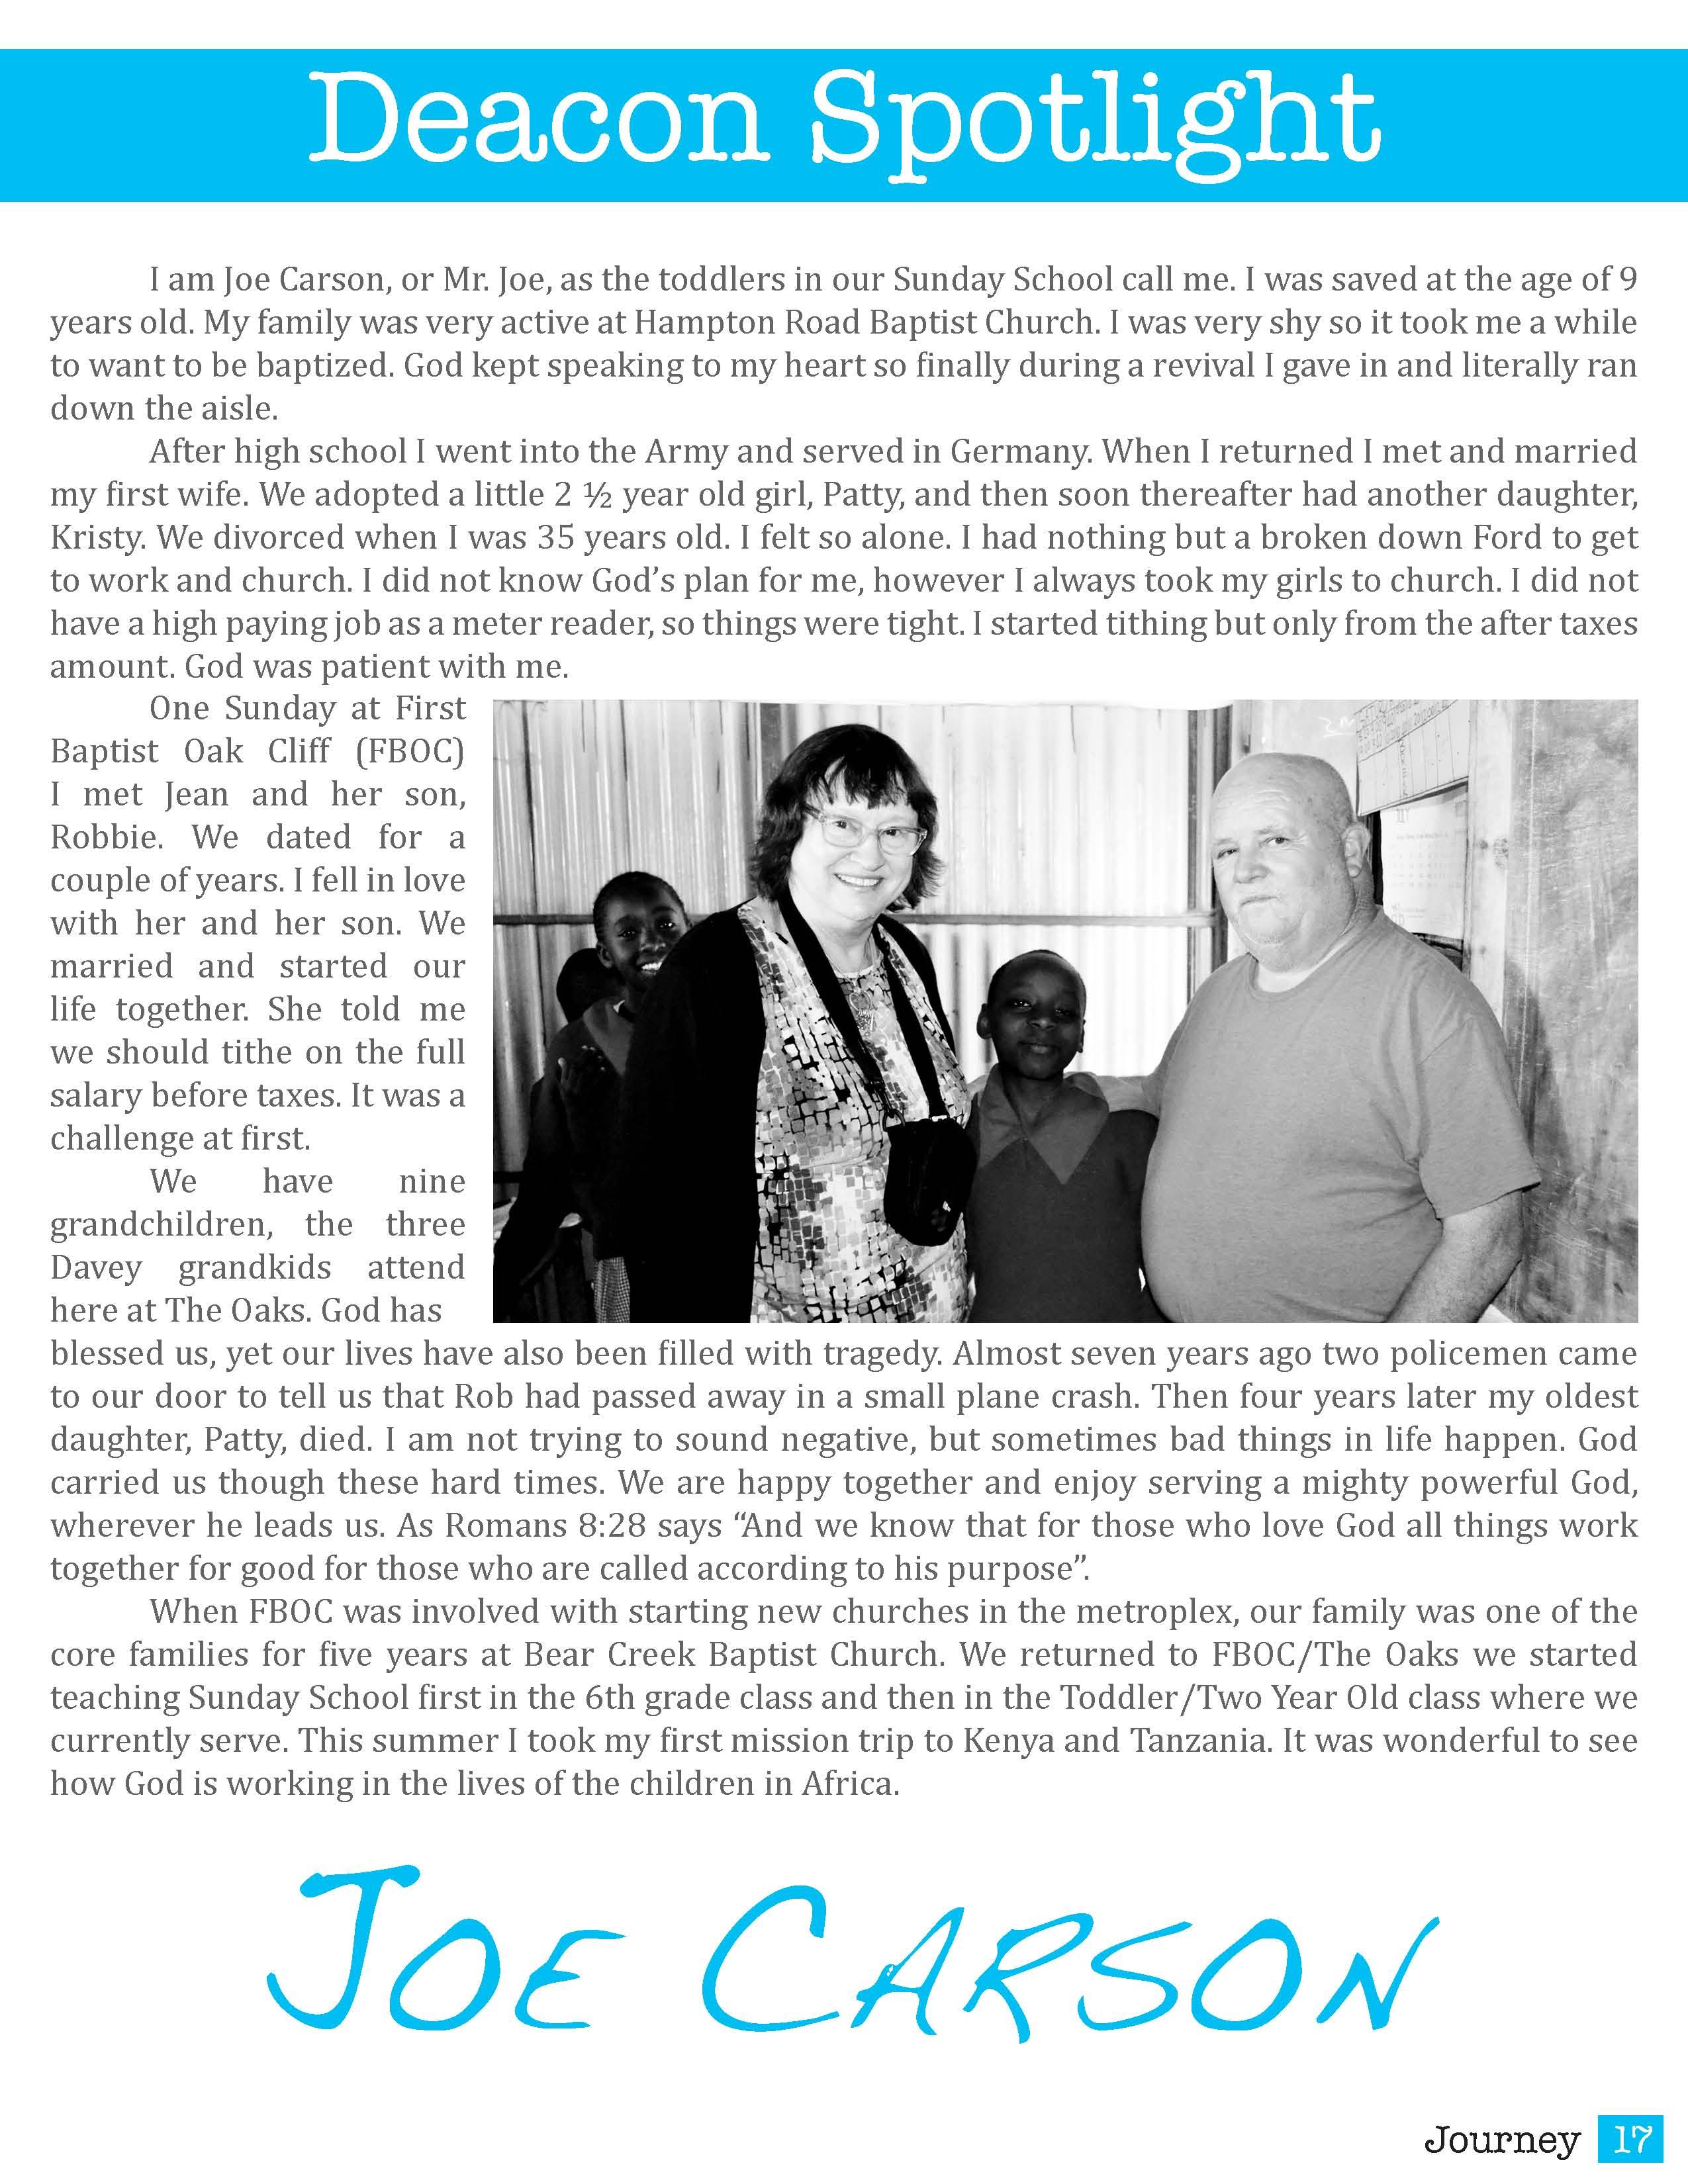 Journey September 2014_Page_17.jpg